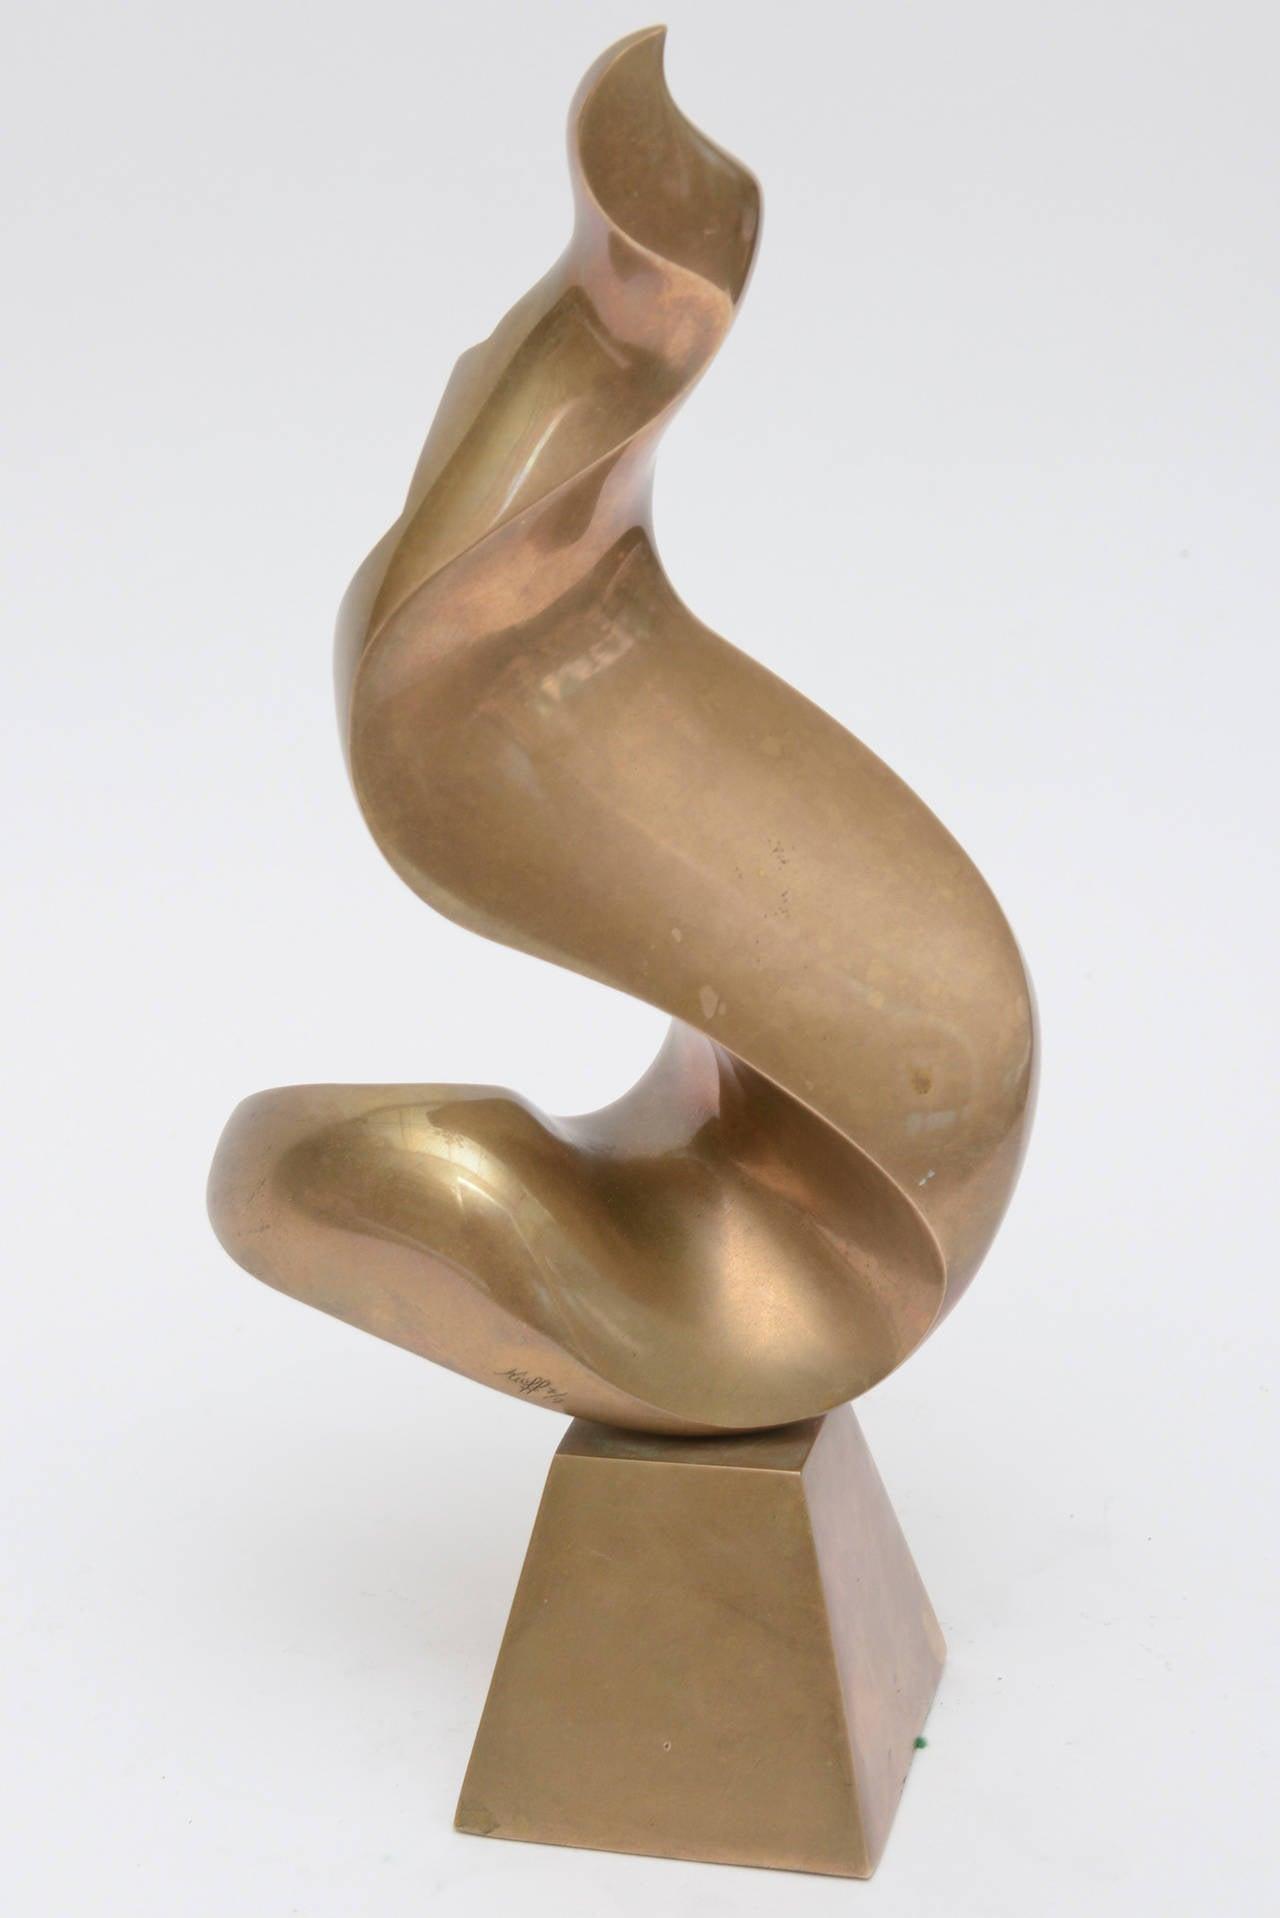 Antonio Grediaga Kieff Bronze Abstract Sculpture Vintage In Good Condition For Sale In North Miami, FL